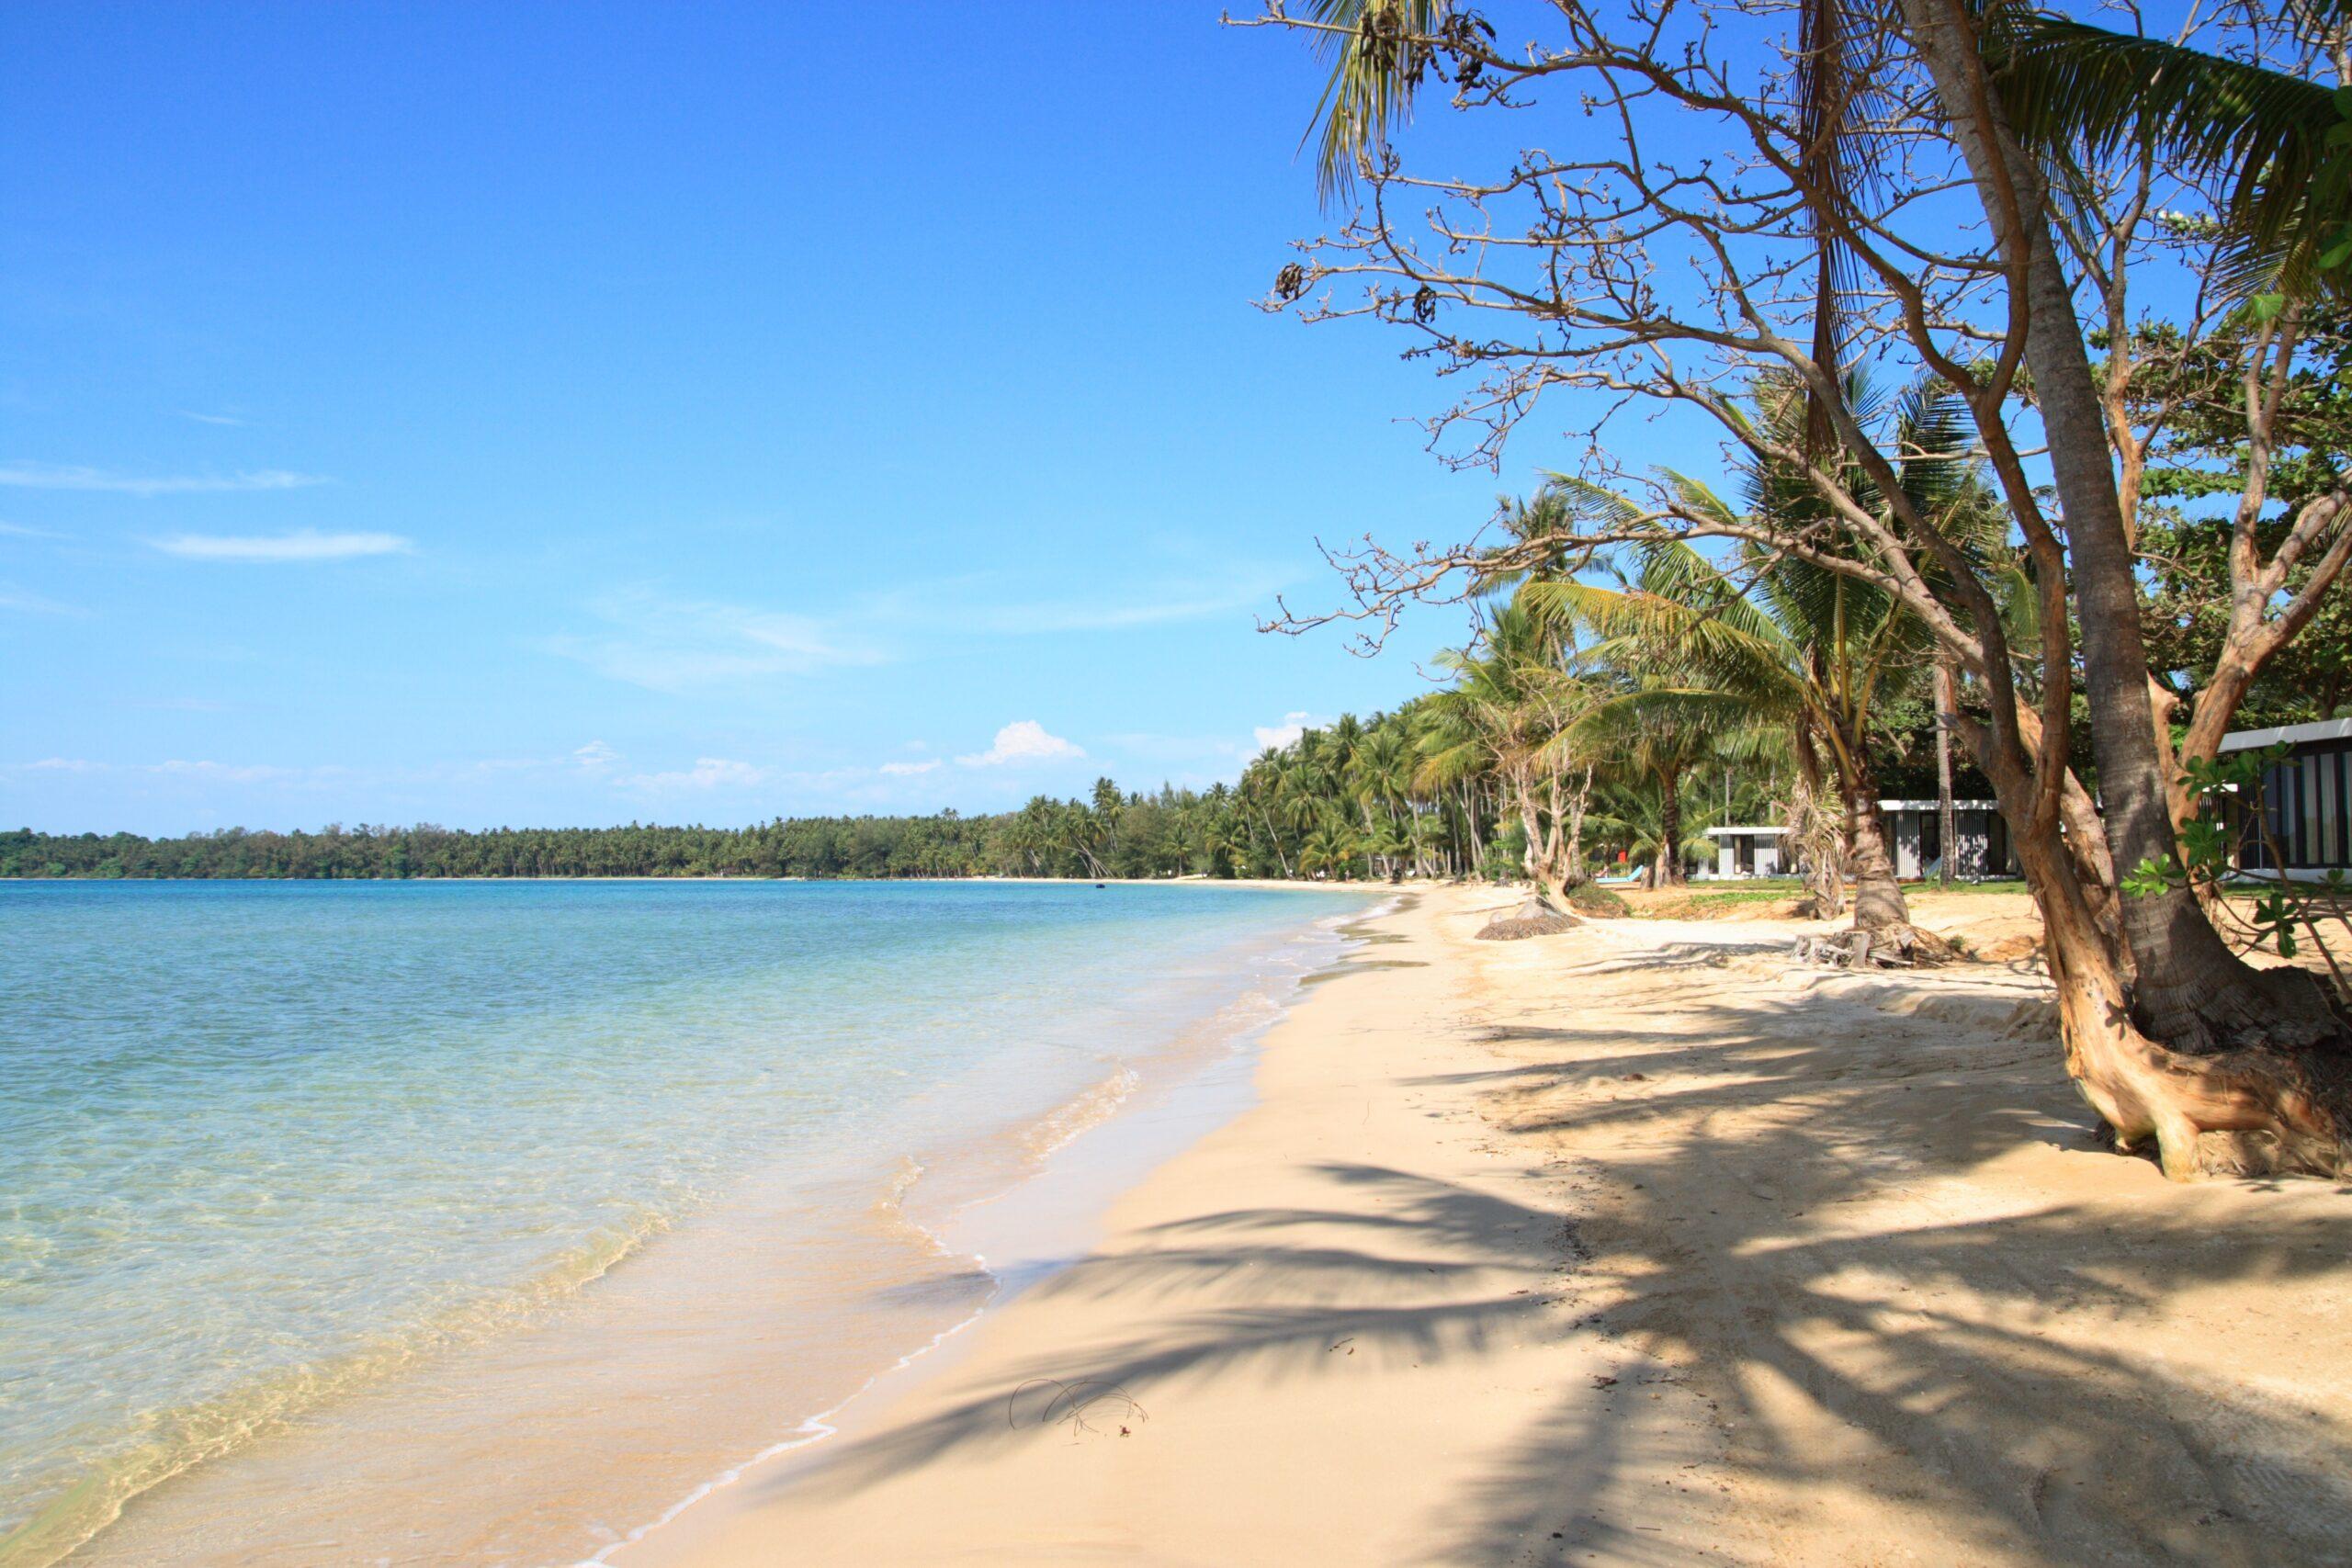 Seavana Beach 2